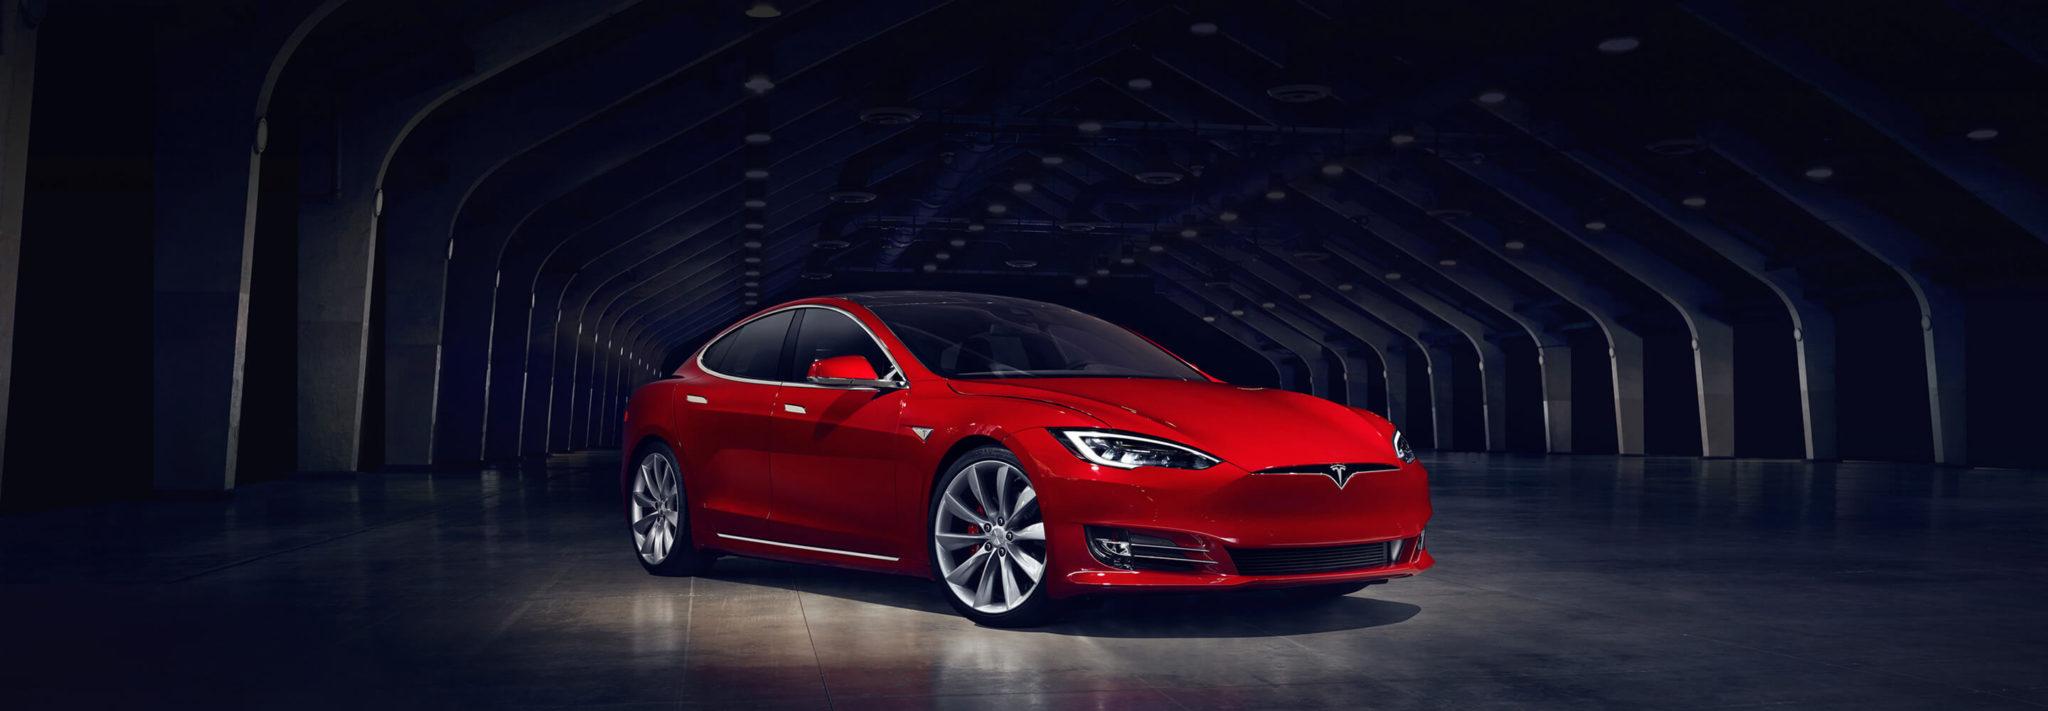 Tesla Suspension Issues Rumor